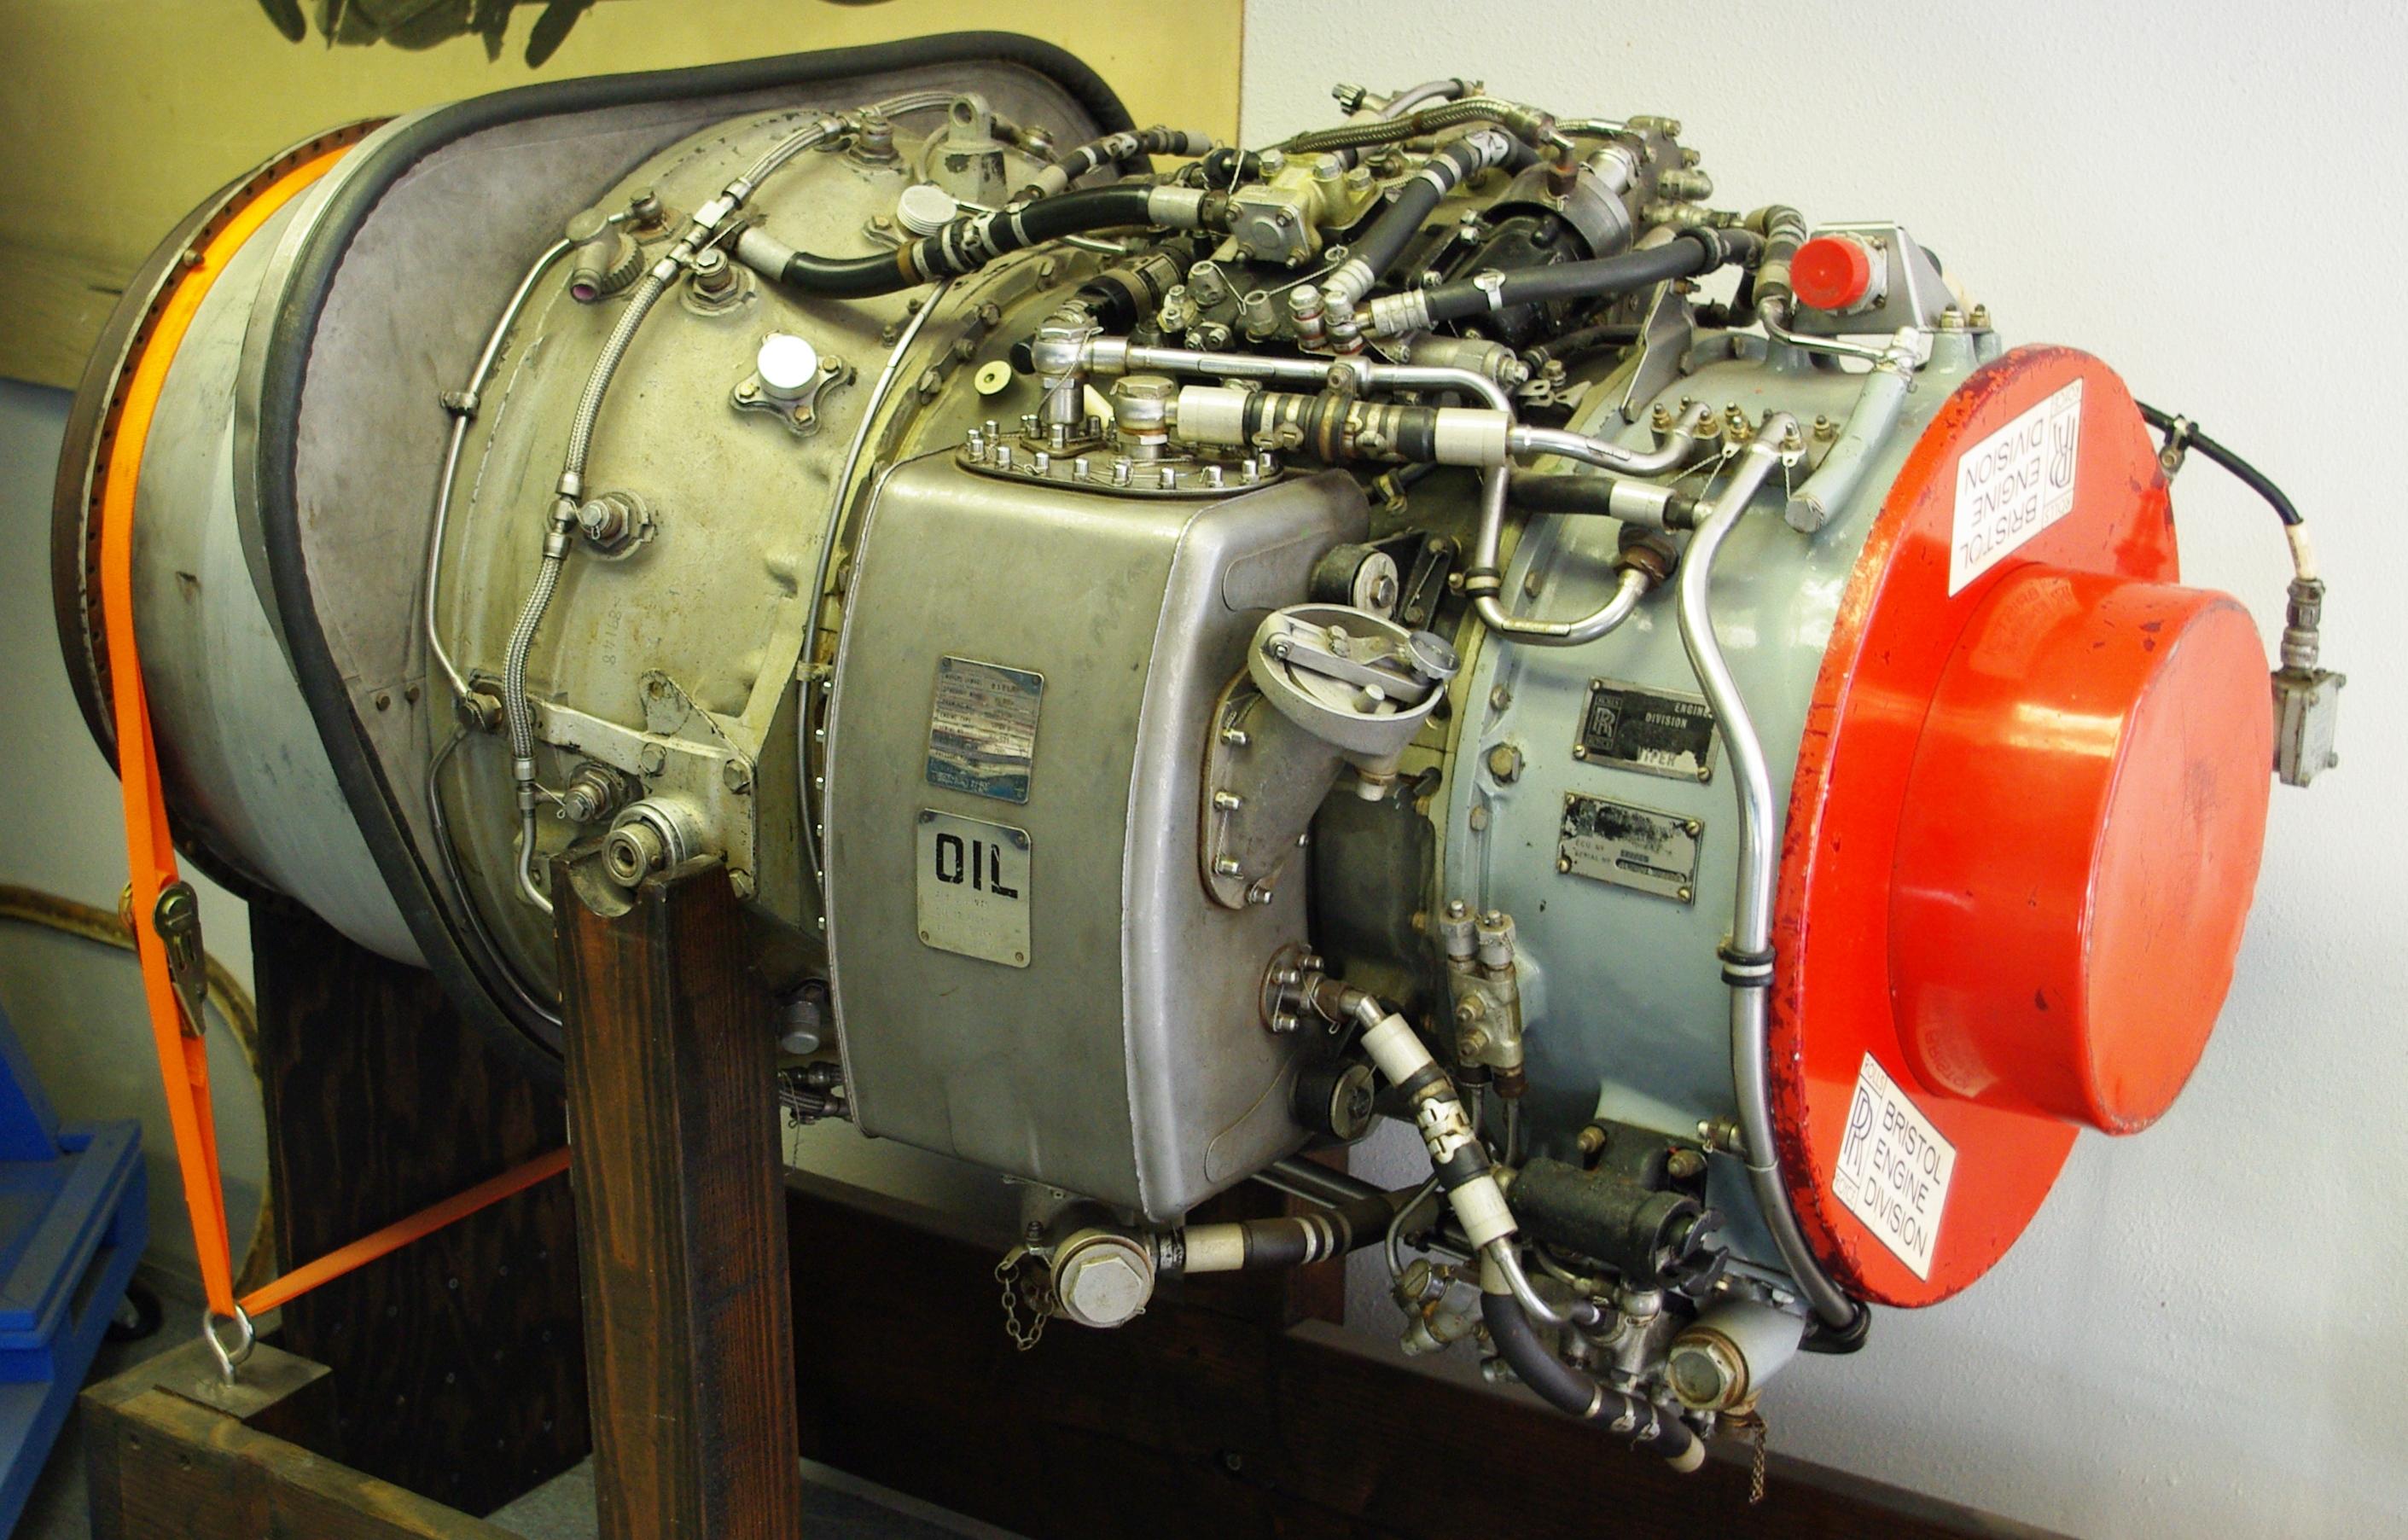 Viper Jet Engine File:rolls-royce Viper Engine